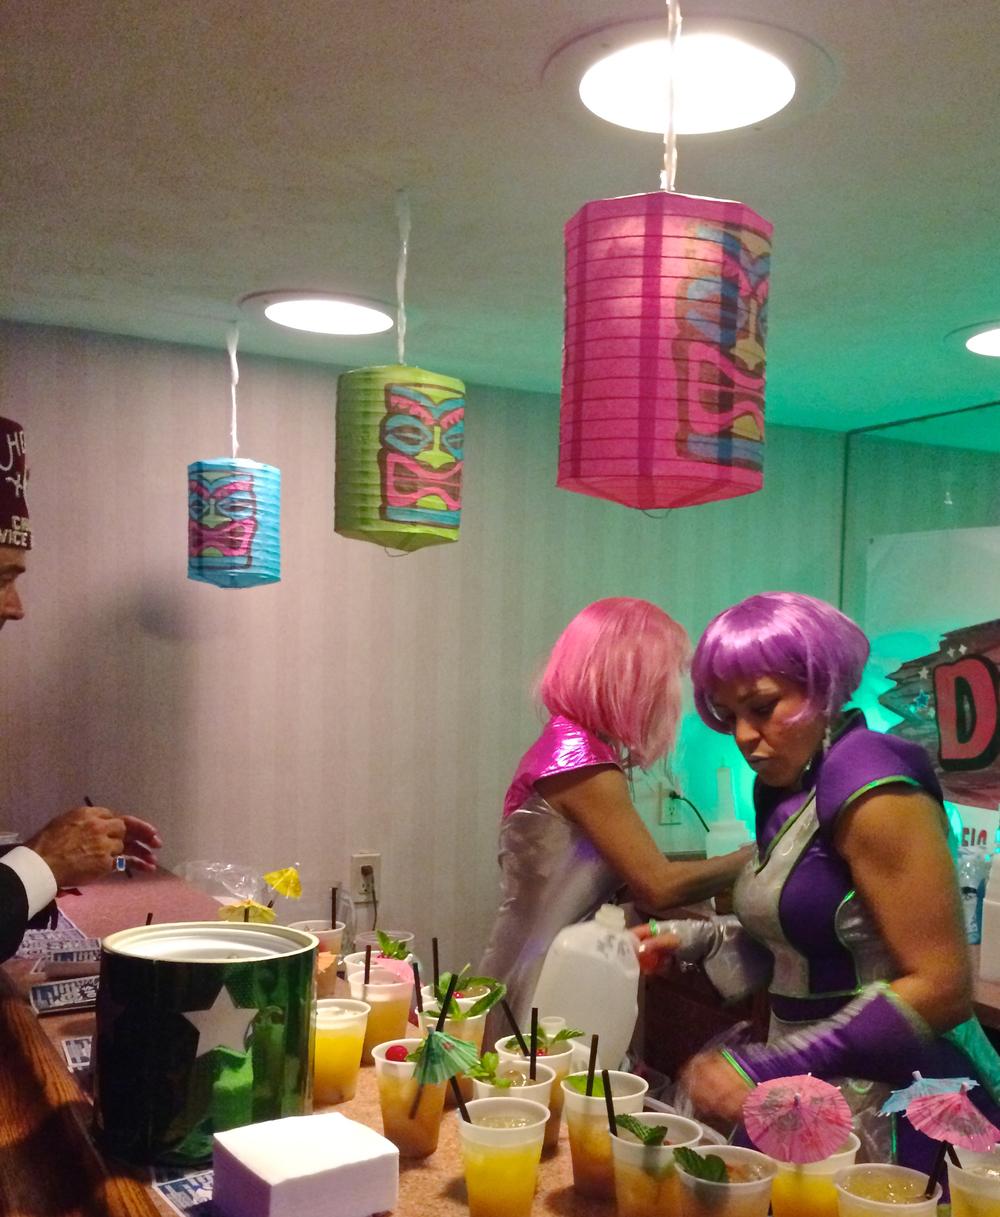 tiki-oasis-room-party.jpg